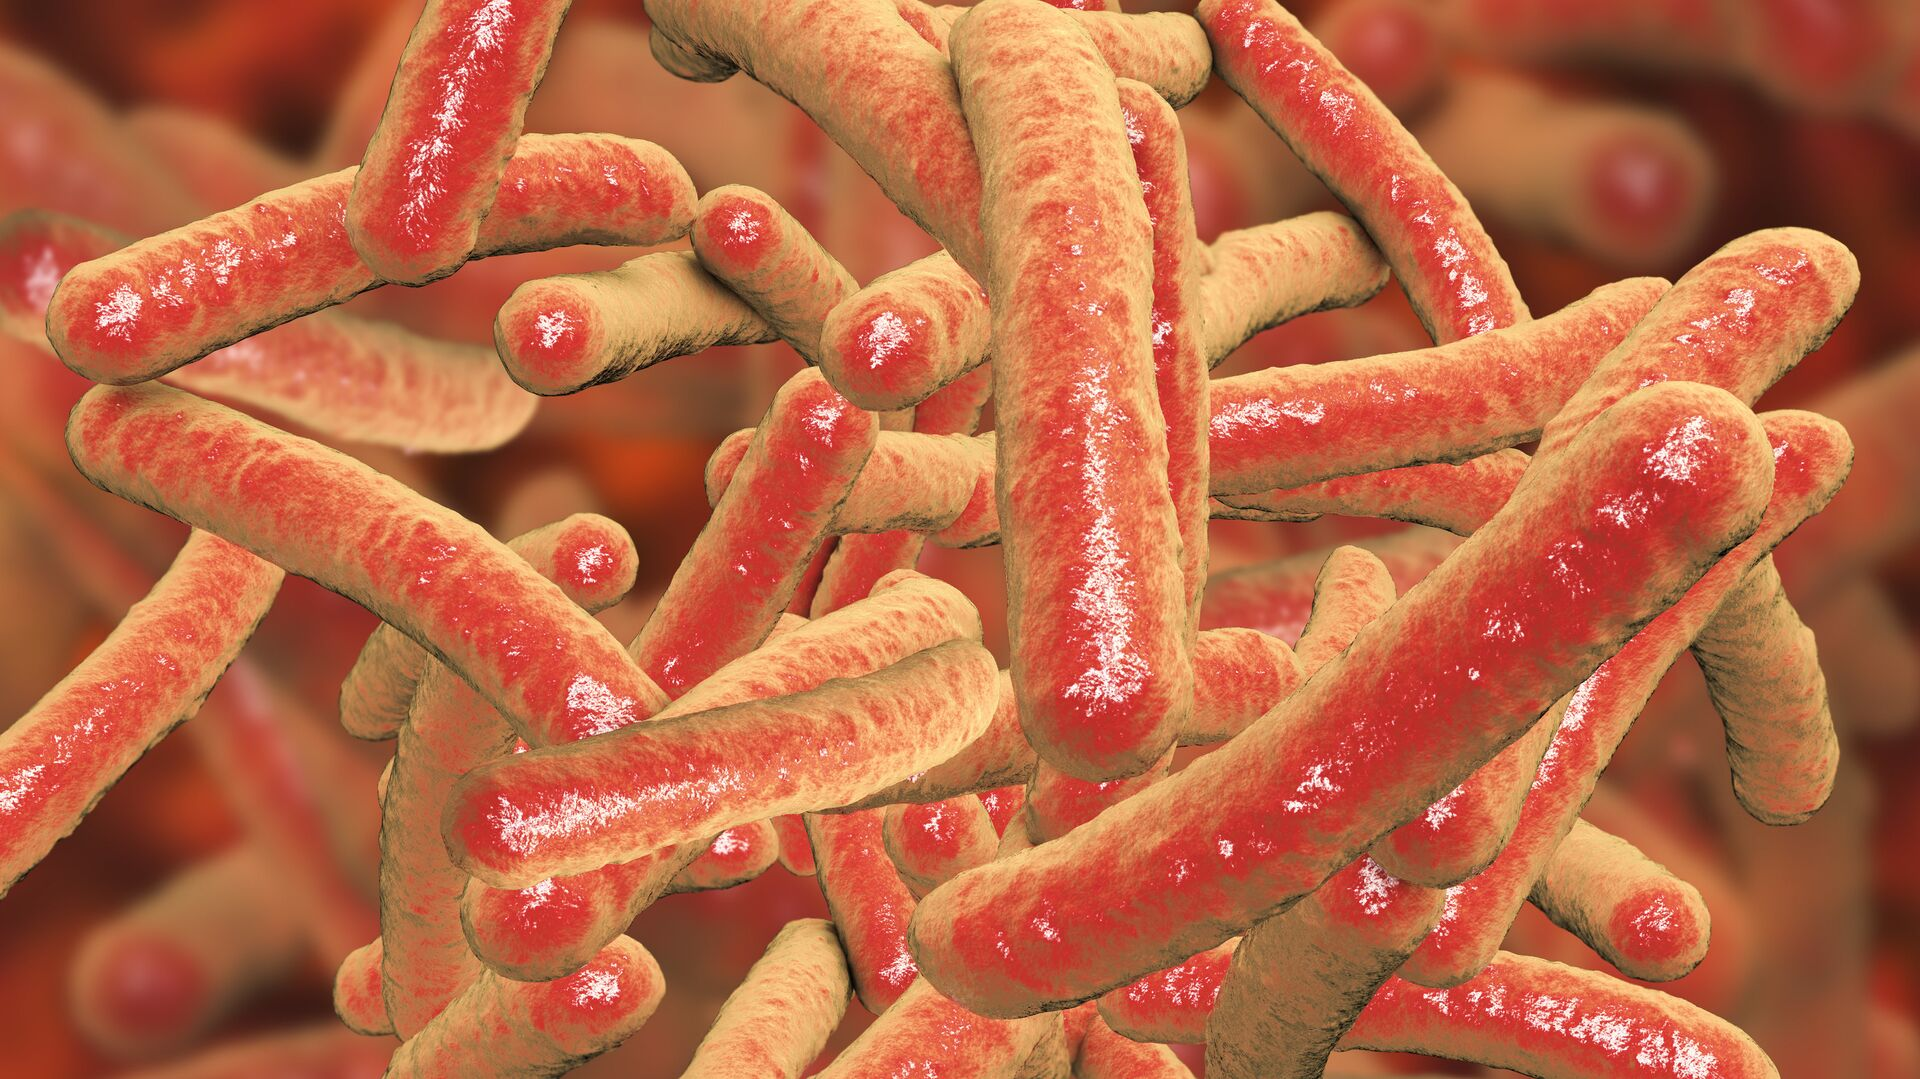 Бактерии Mycobacterium tuberculosis, возбудитель туберкулеза - РИА Новости, 1920, 24.03.2020